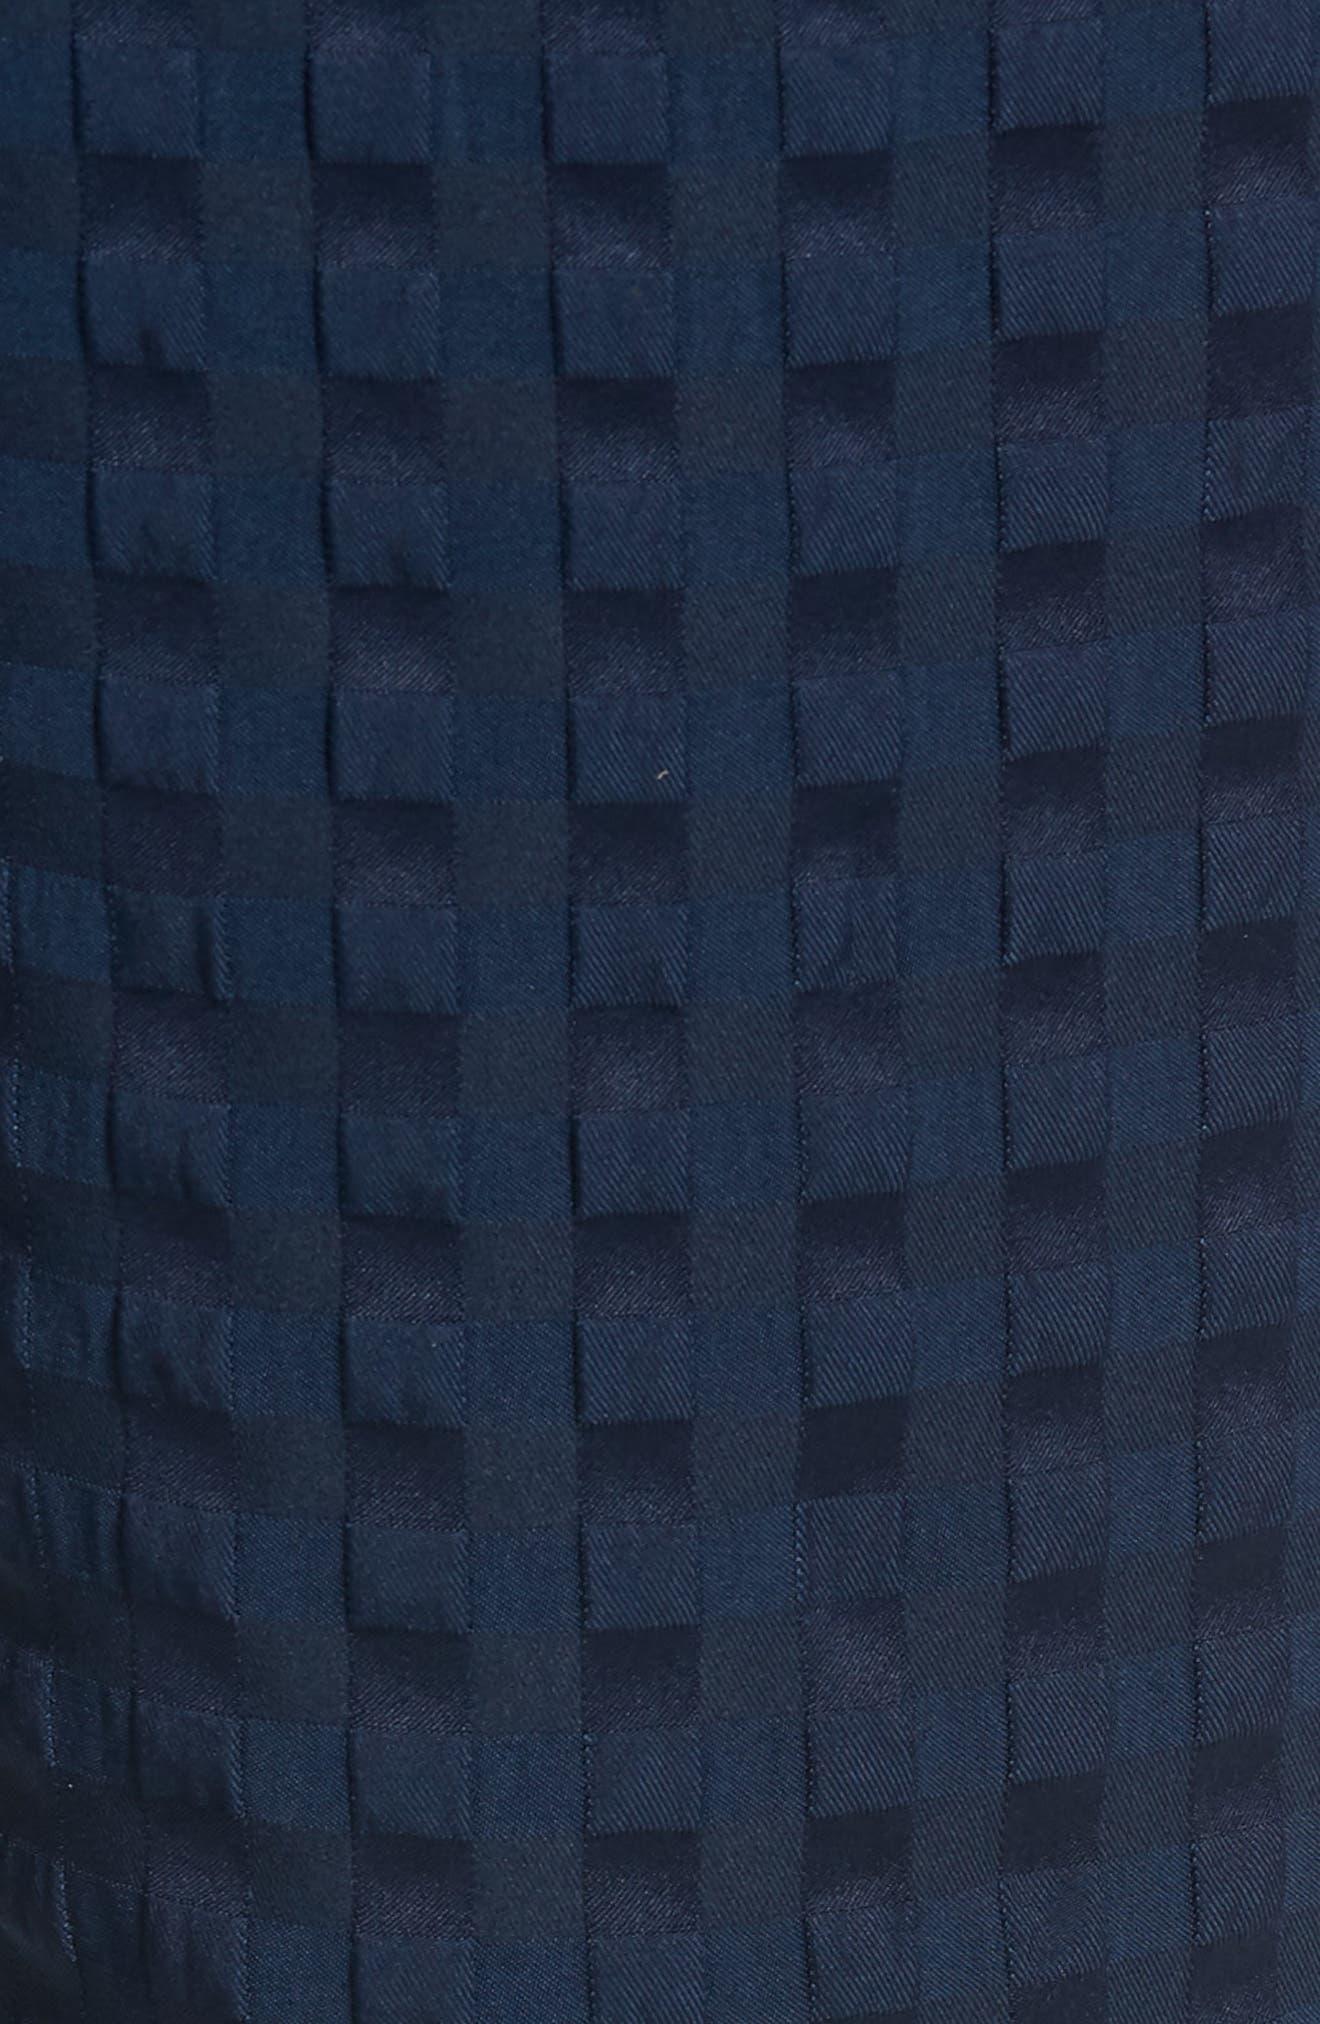 ADIDAS ORIGINALS, Check Seersucker Track Pants, Alternate thumbnail 6, color, COLLEGIATE NAVY